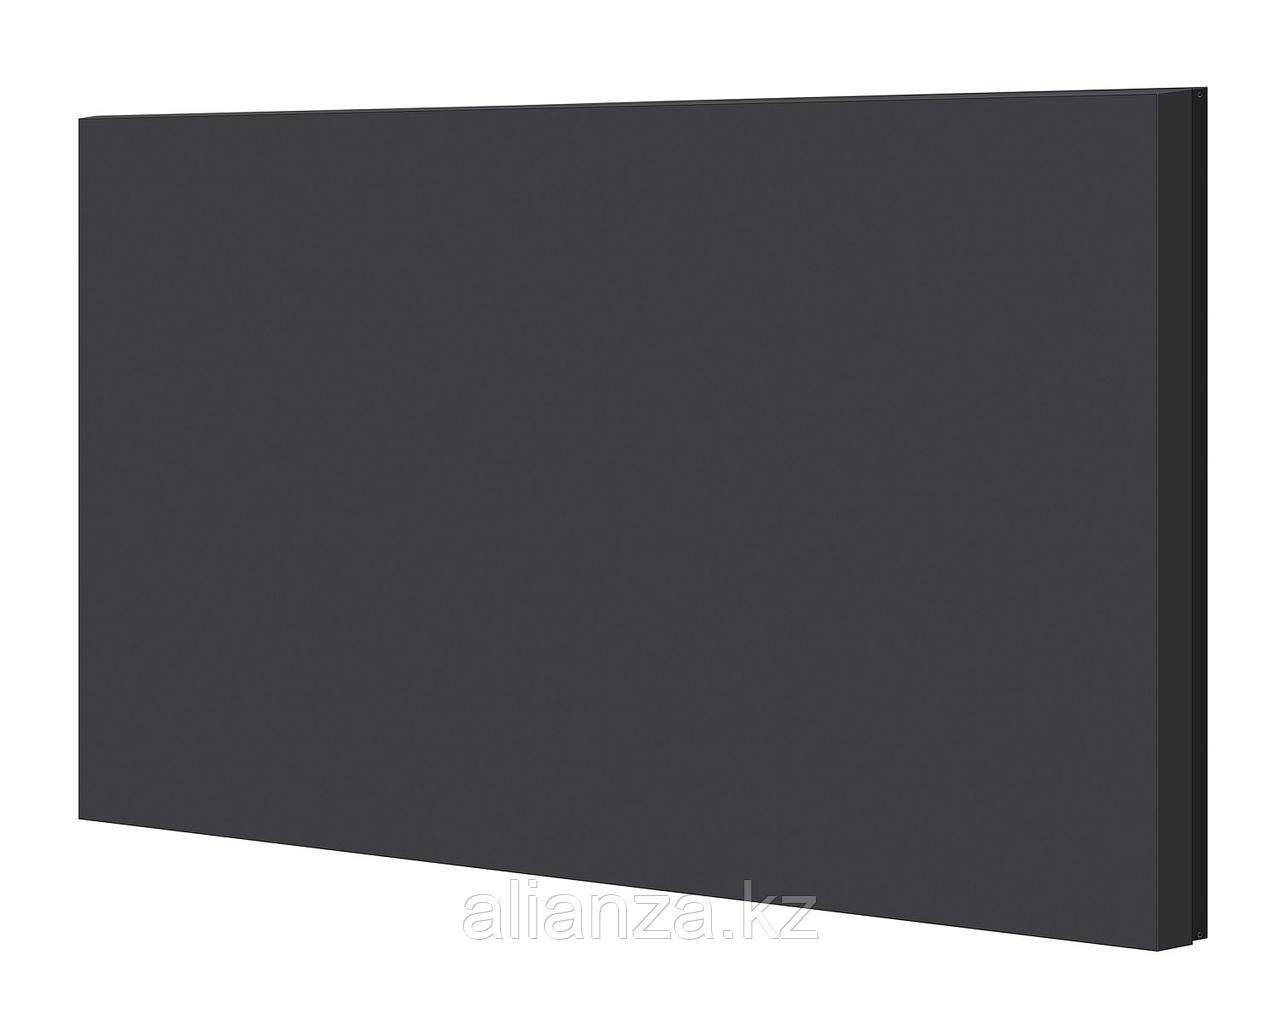 LED панель Panasonic TH-55VF2HW